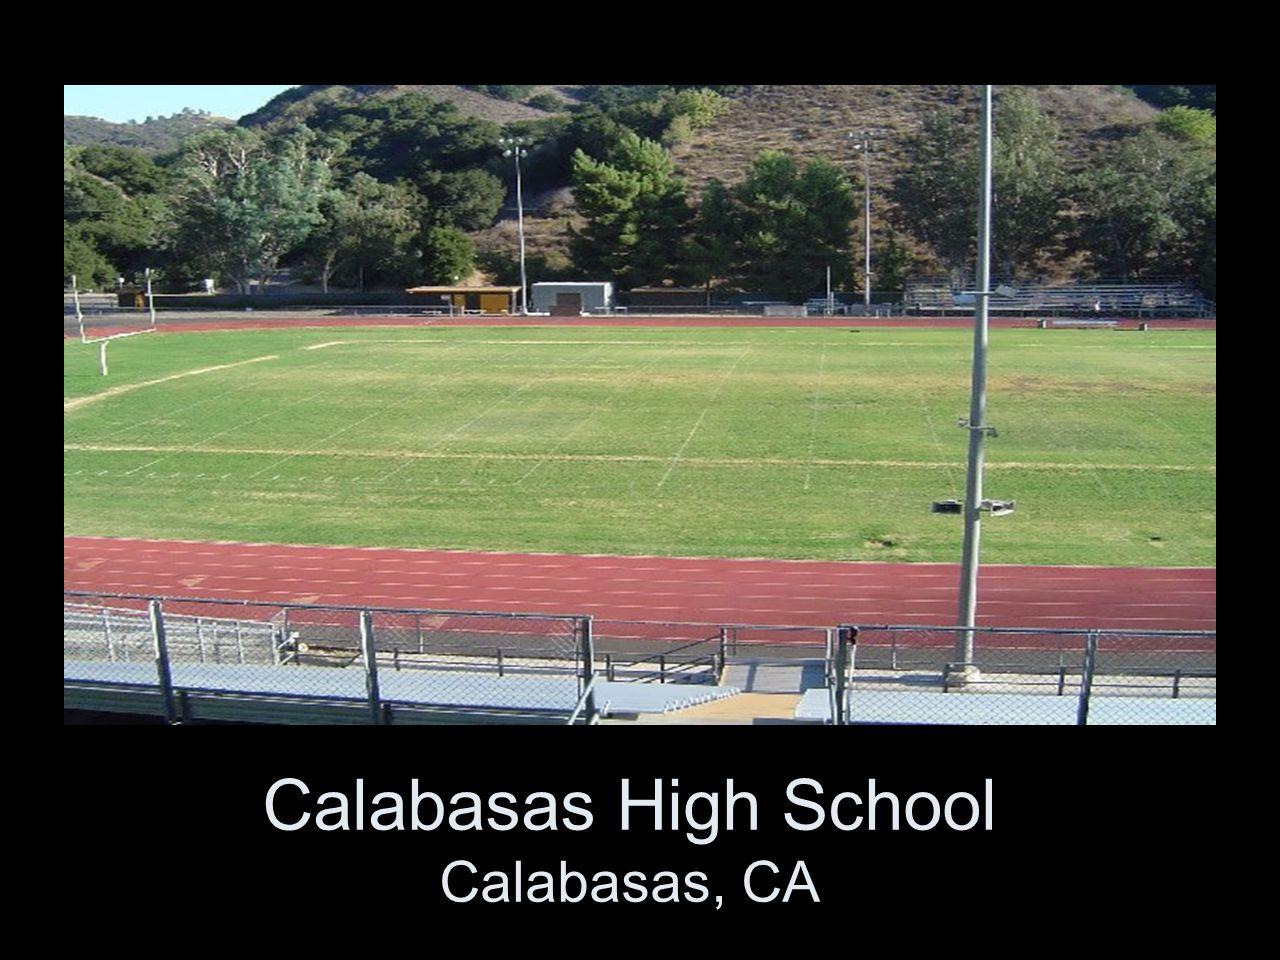 Calabasas High School Calabasas, CA